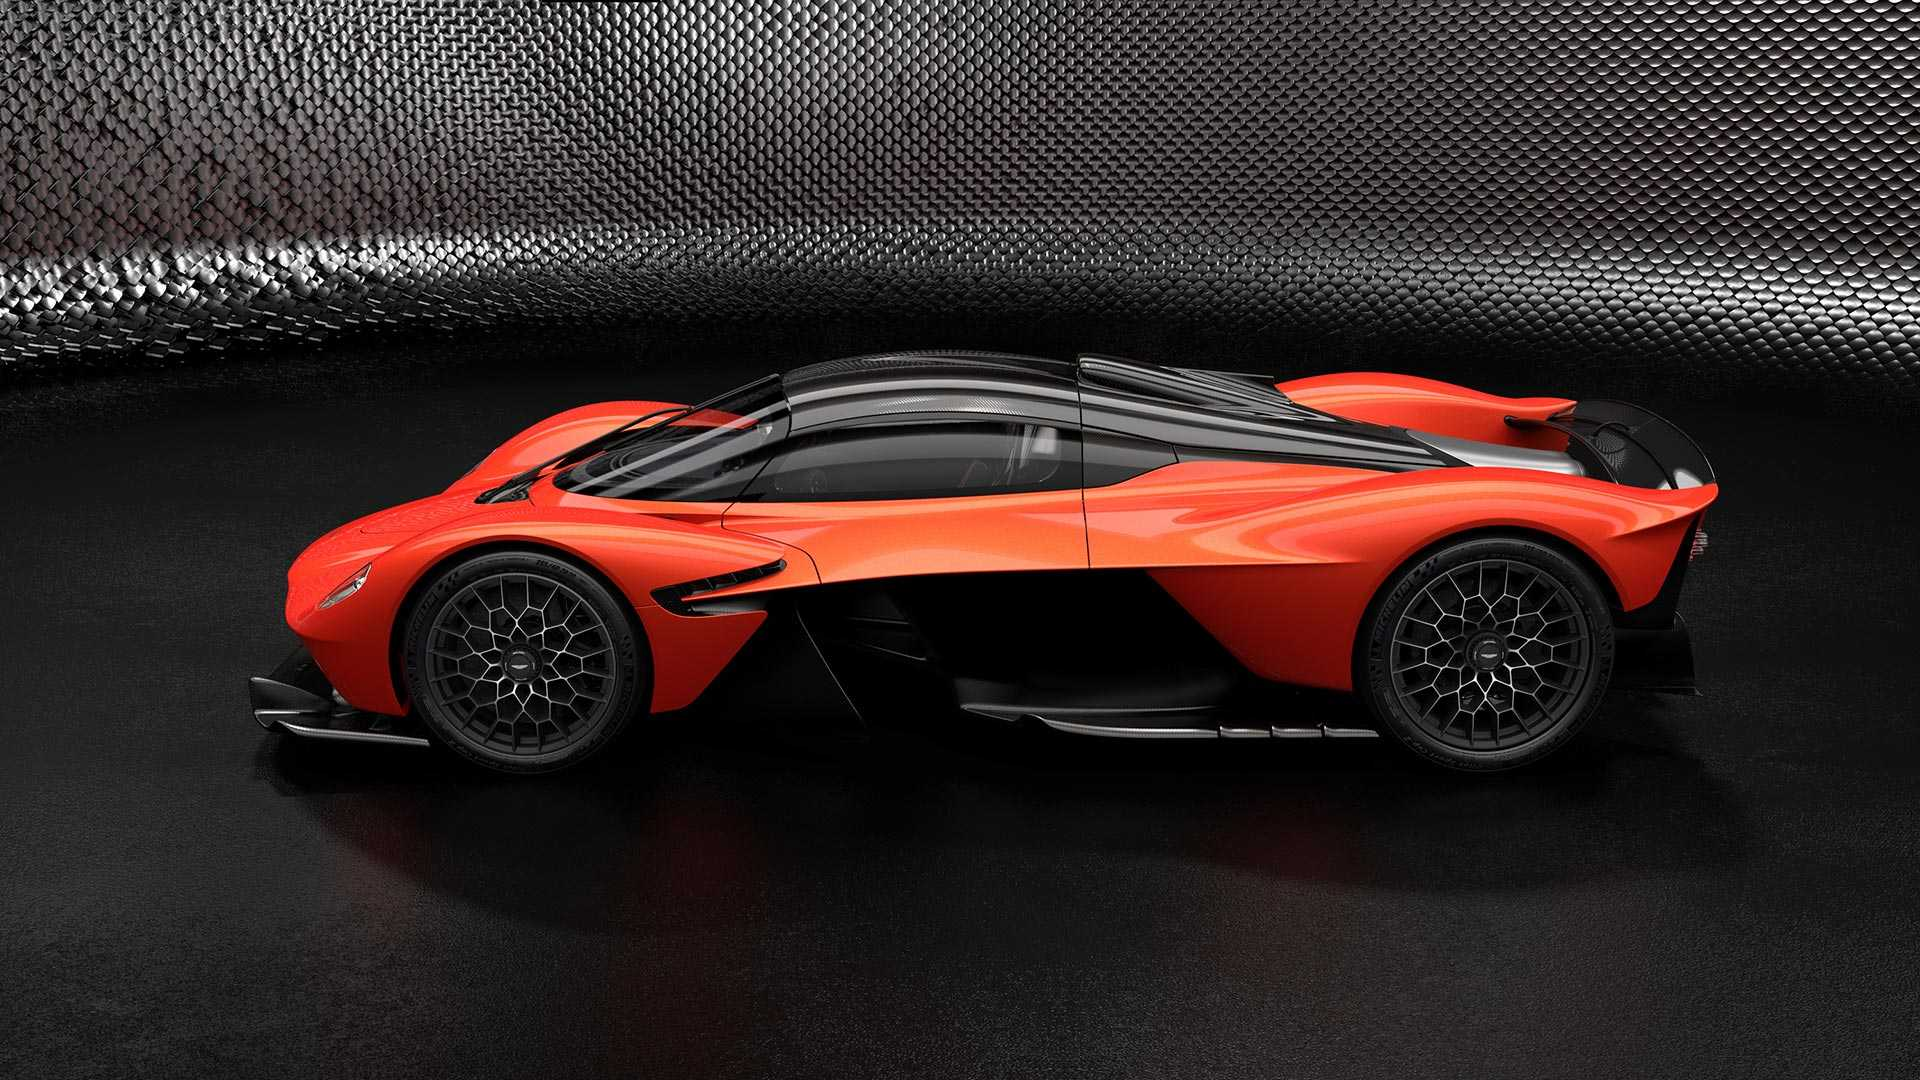 Aston Martin Valkyrie će pokušati da sruši rekord kruga na Nirburgringu